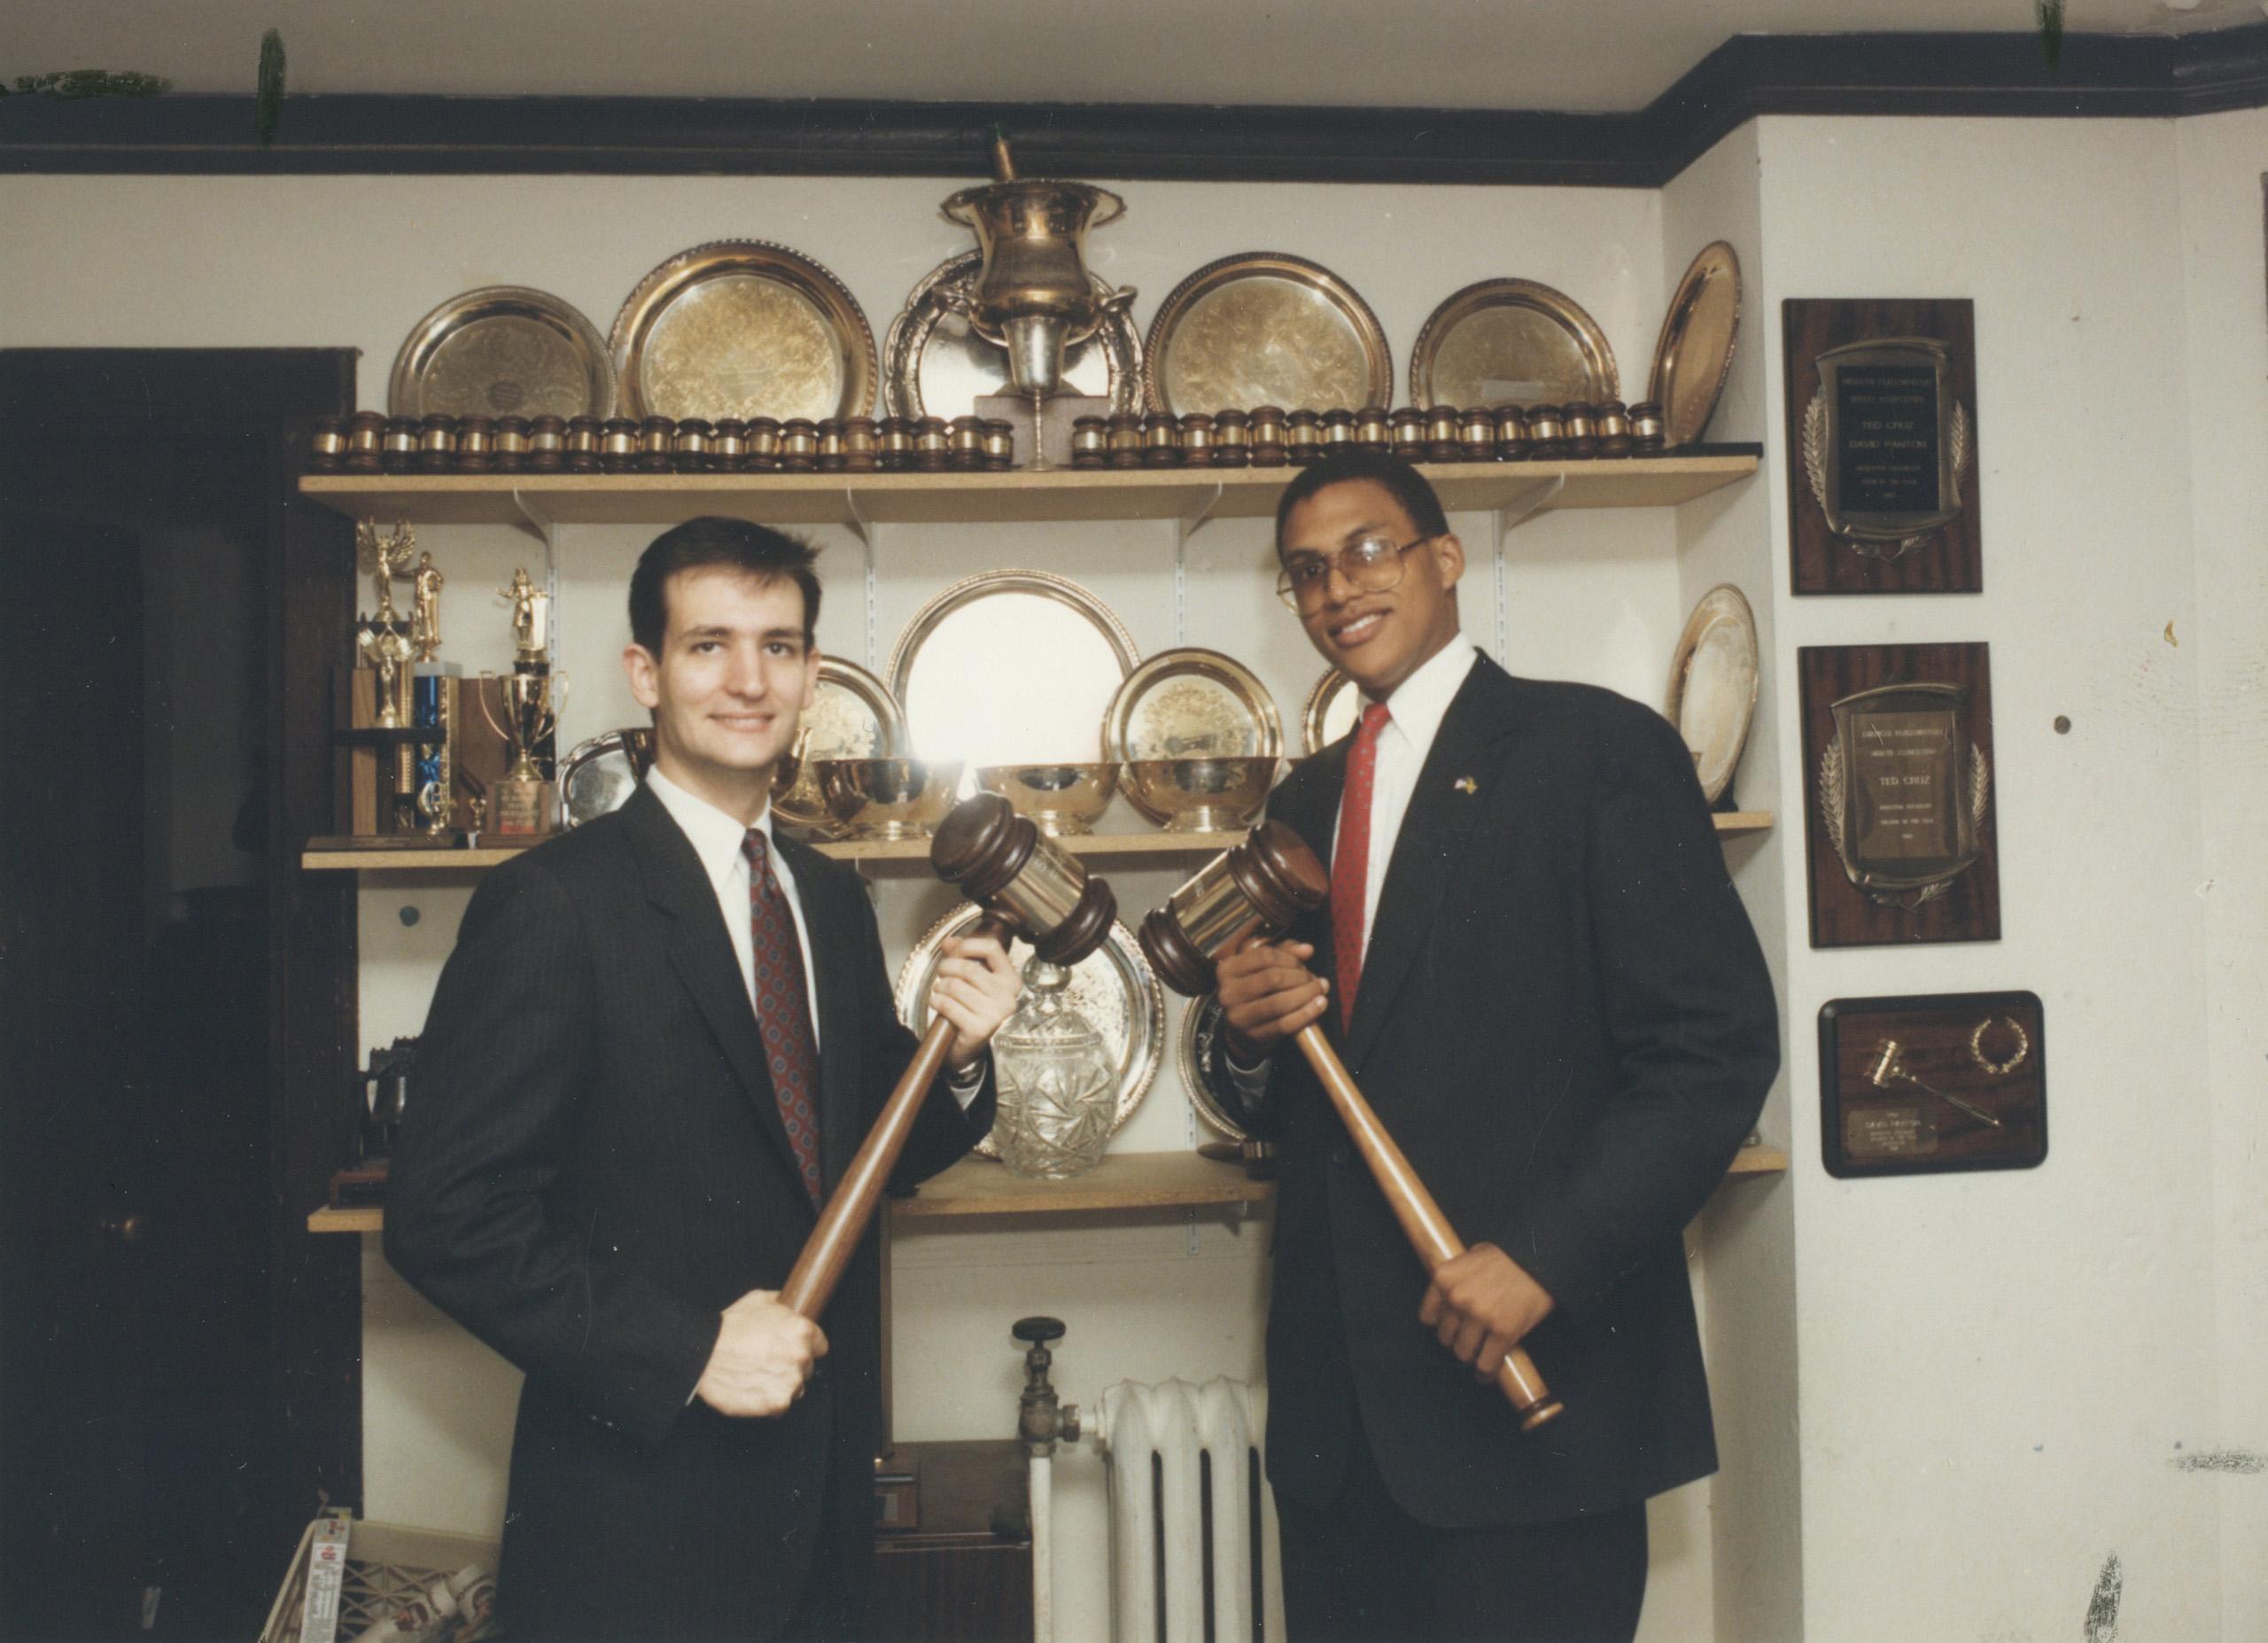 Ted Cruz and David Panton, debate teammates and close friends at Princeton University in Princeton, N.J. on June 5, 1992.